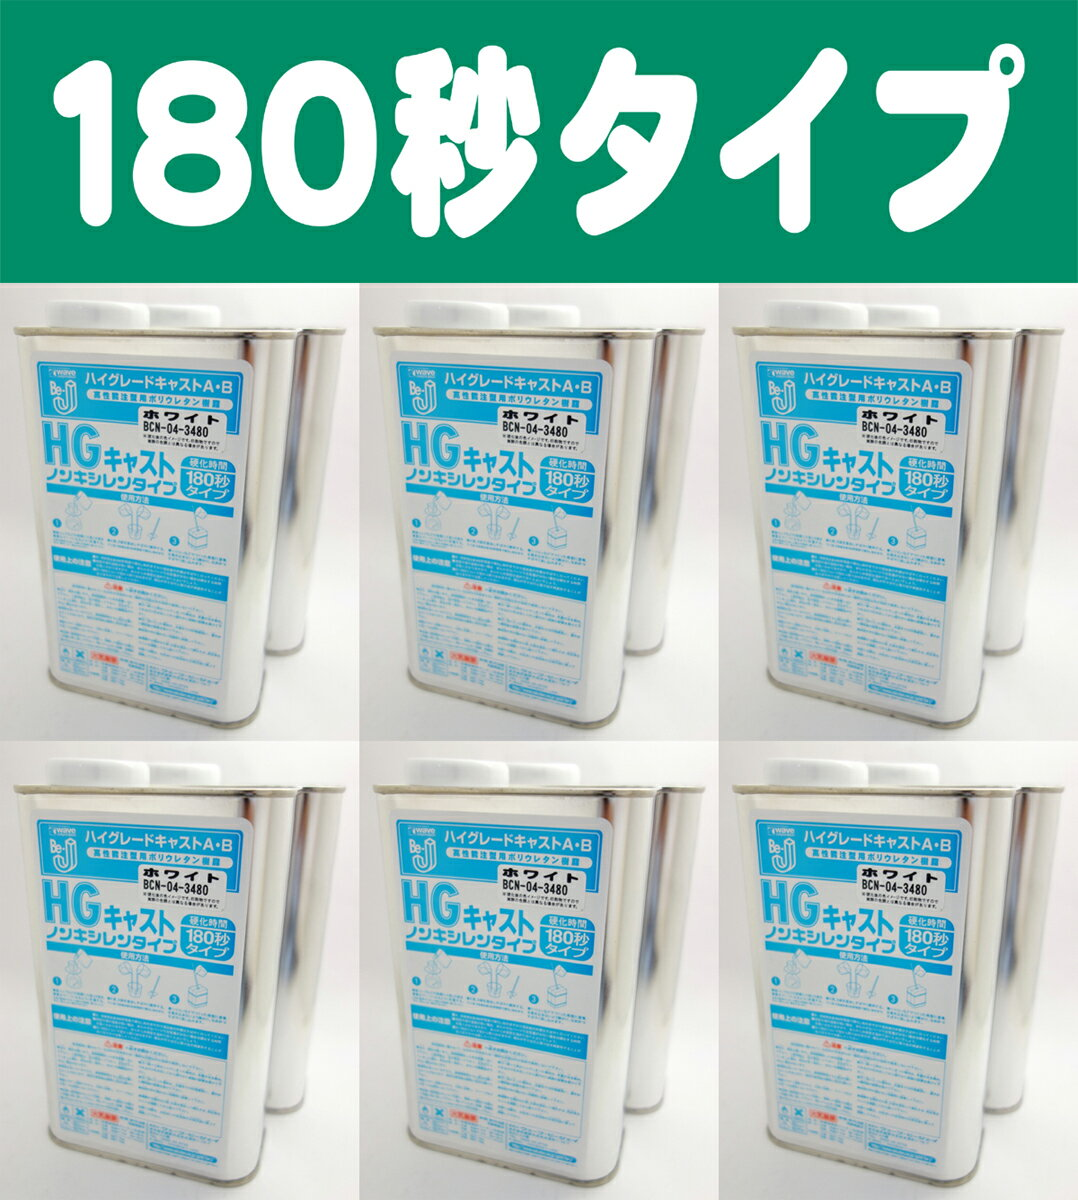 Be-J HGキャスト ホワイト【180秒タイプ】12kgセット(ノンキシレン 2kg×6セット)【BCN-042】